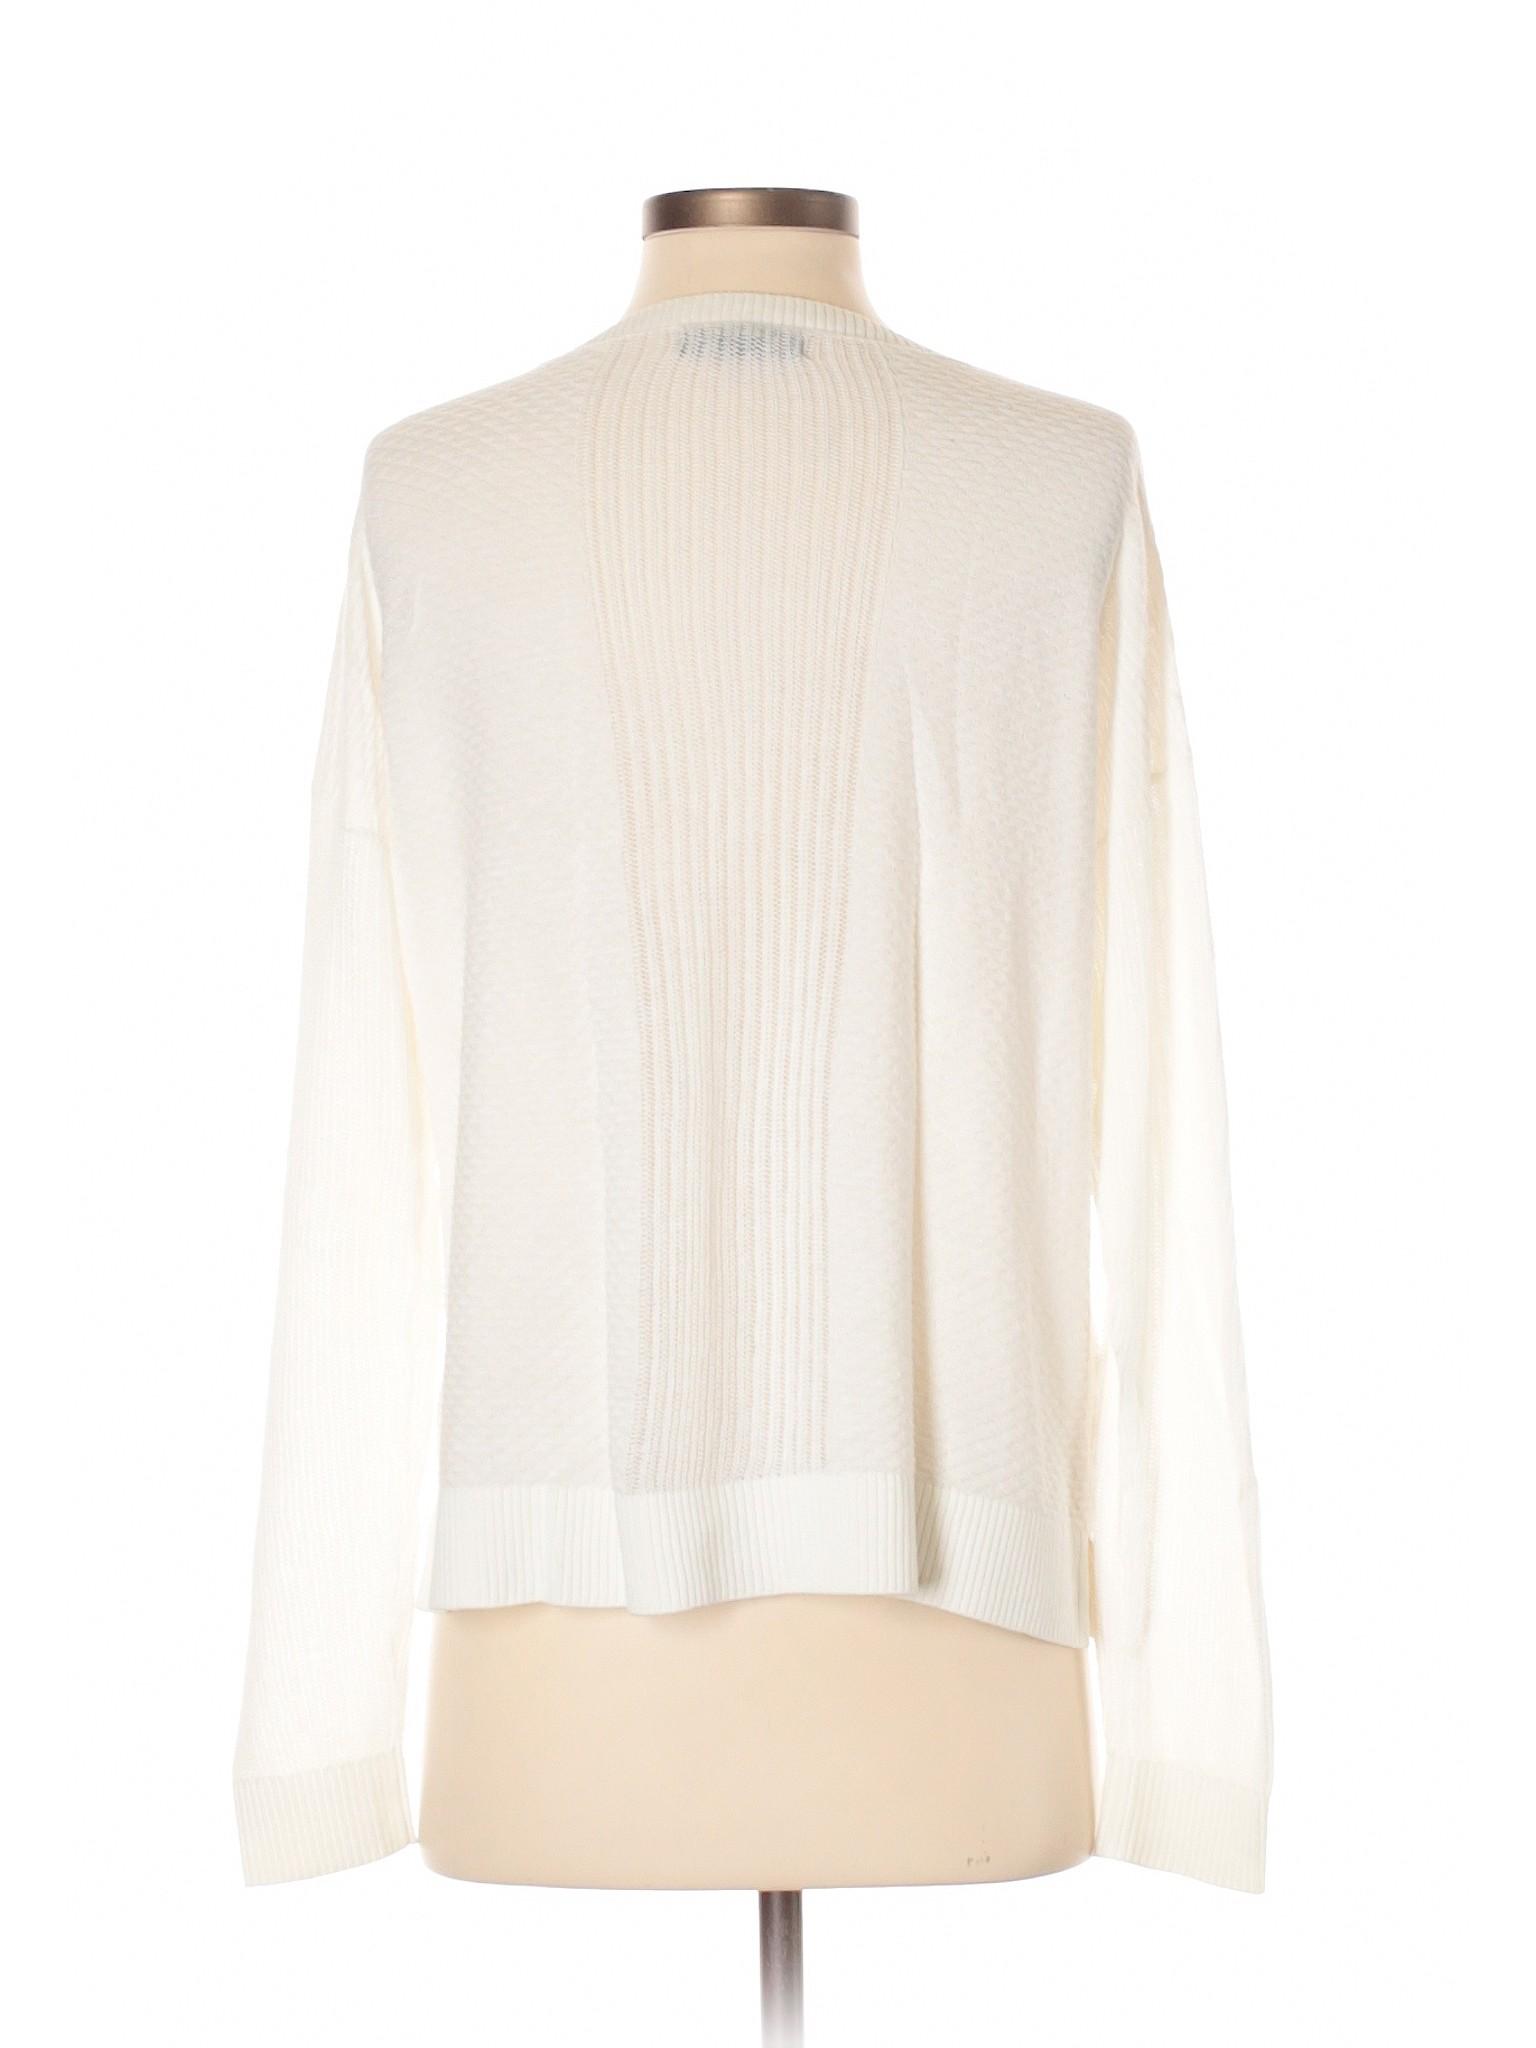 Boutique Sweater Republic Banana Store Factory Pullover w70q4w